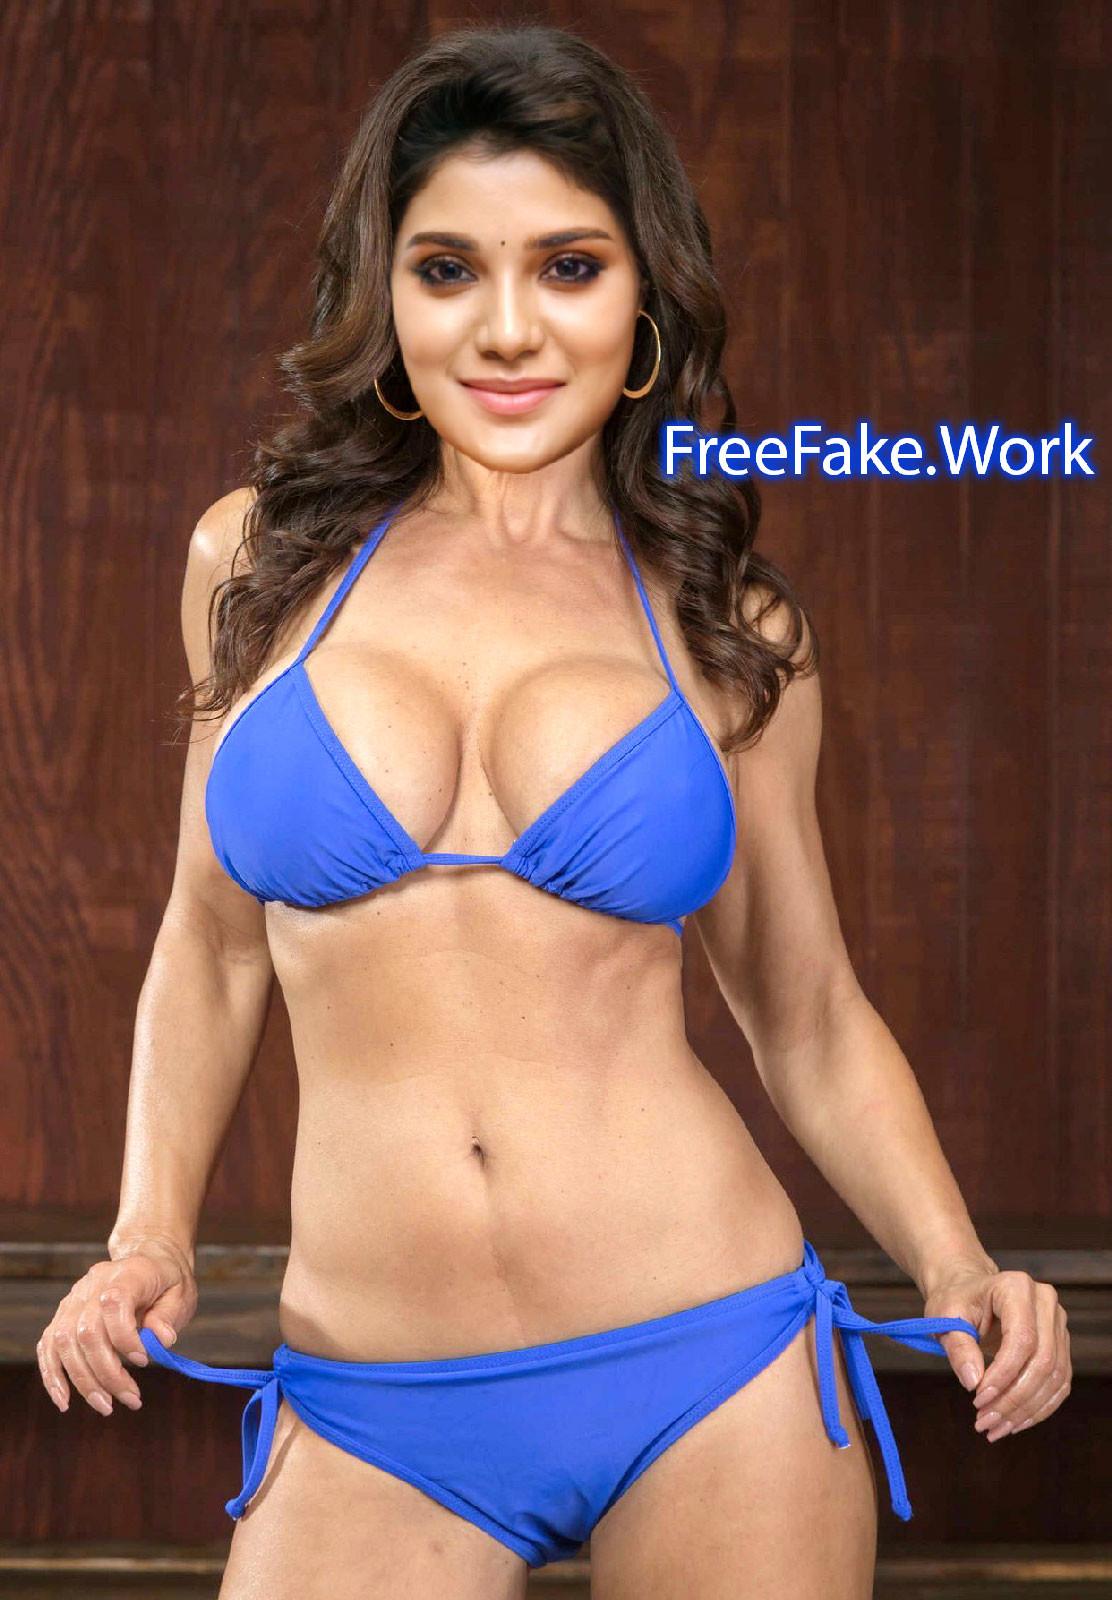 Aathmika-2-piece-bikini-nude-navel-Hot-HD-Photos.jpg